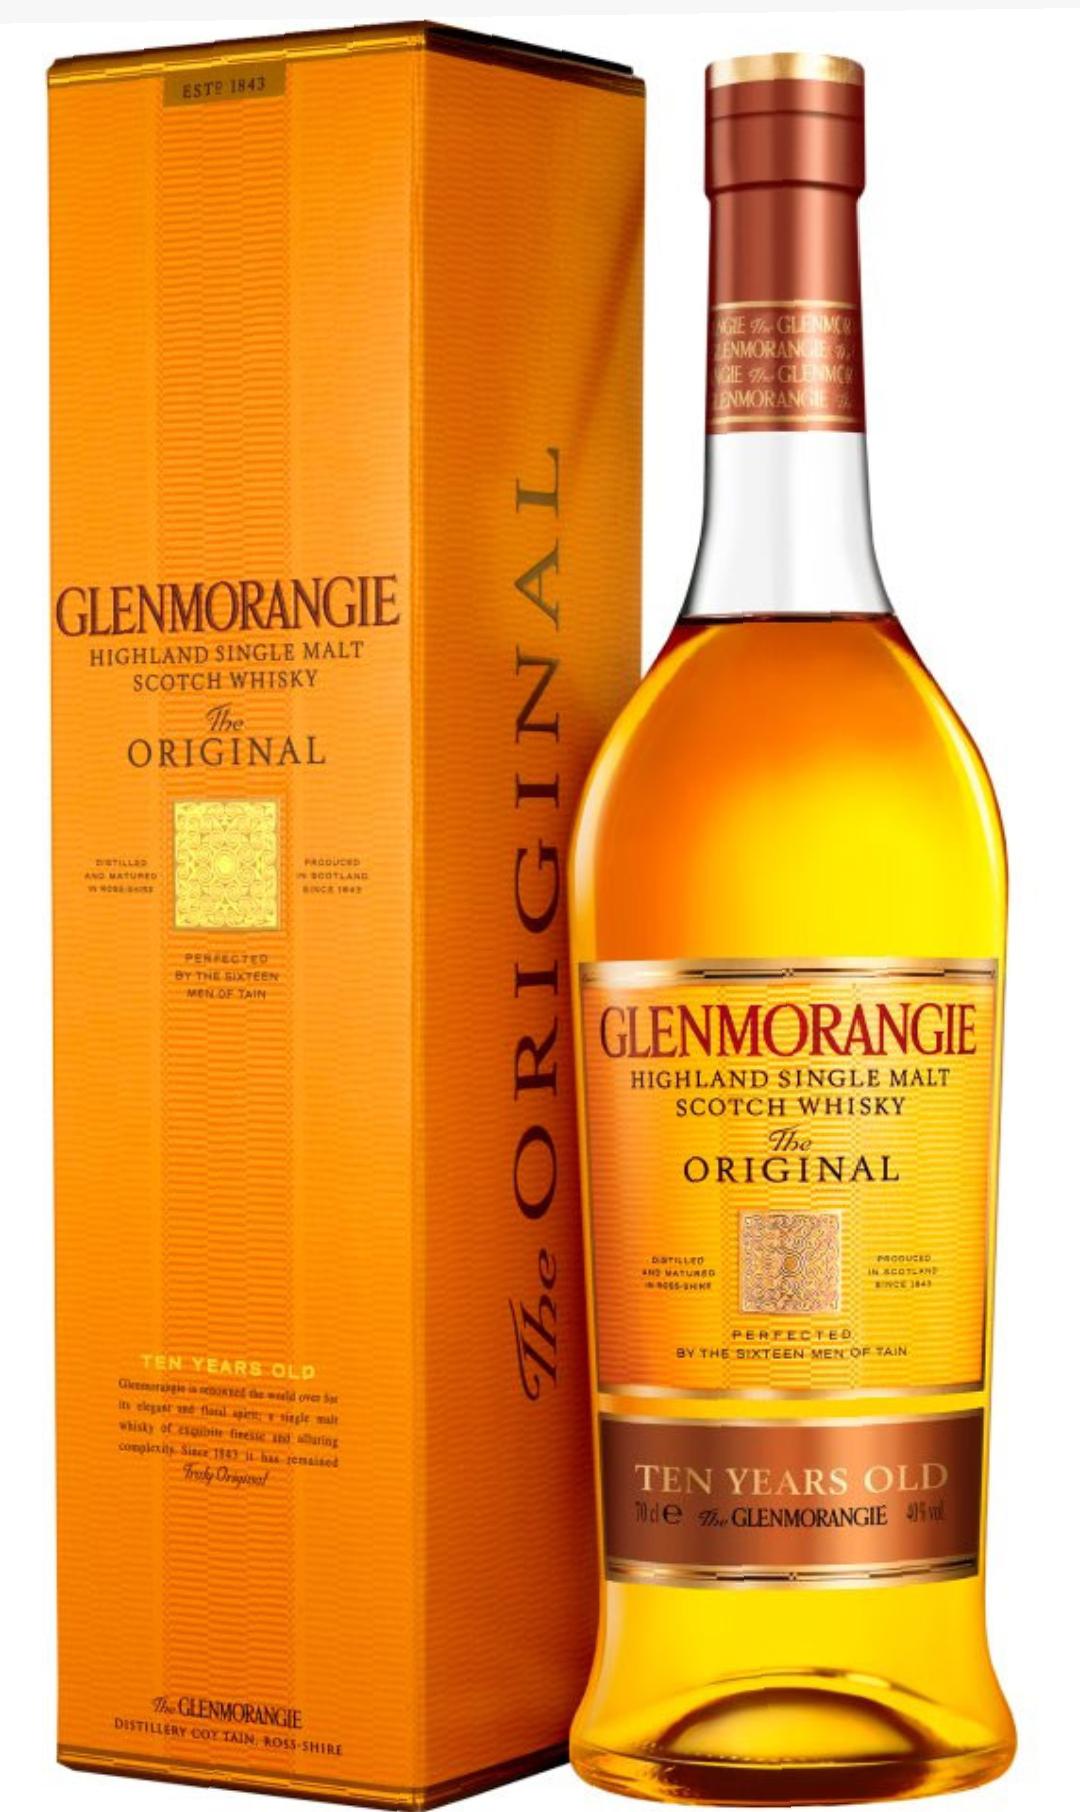 Glenmorangie 10YO £26 @ Sainsbury's